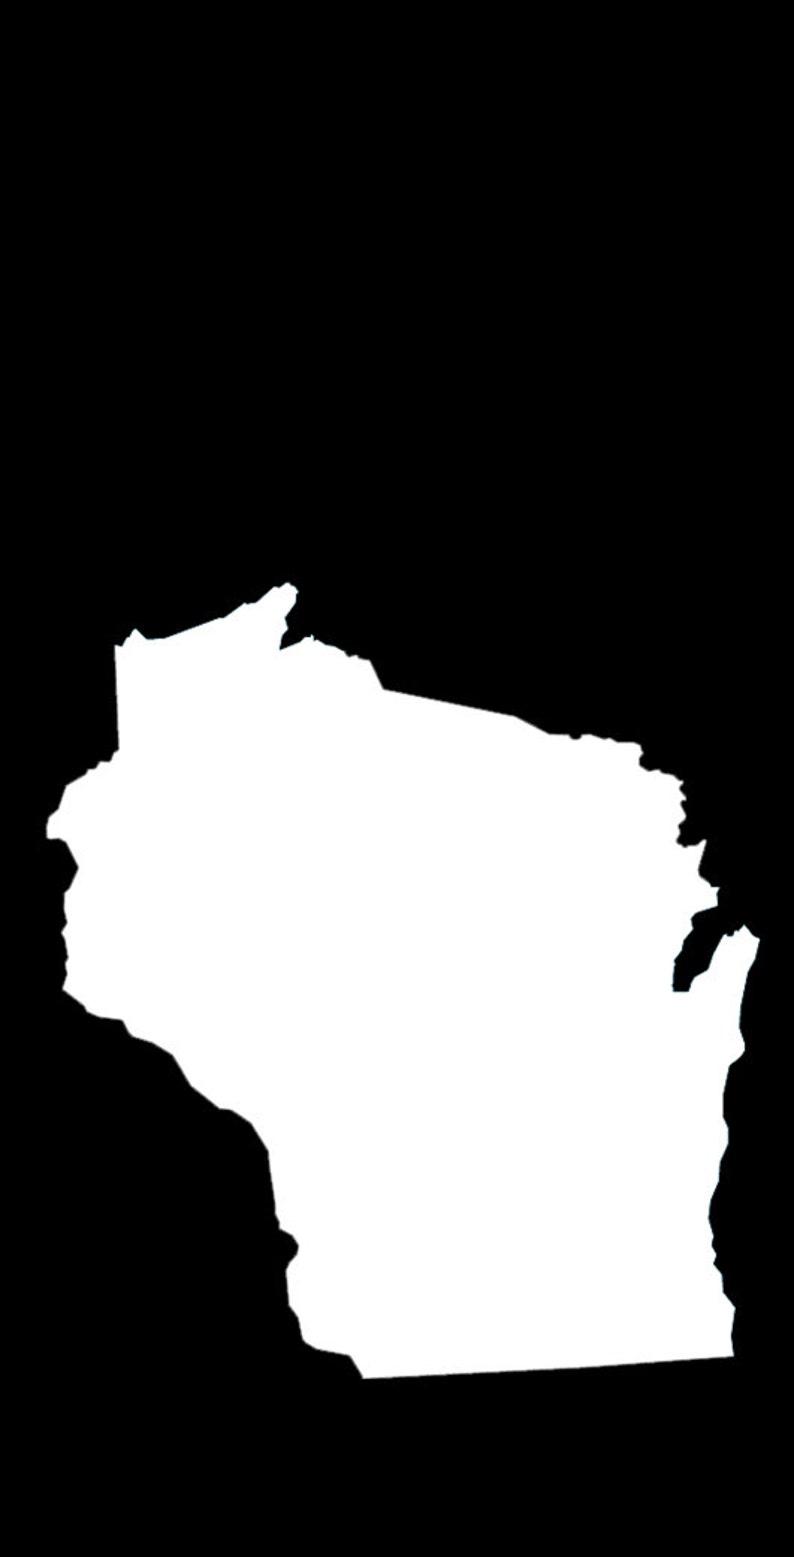 1x4 Corn Hole Bag Toss Regulation Size Custom Cornhole Board Game Set Wisconsin light Weight